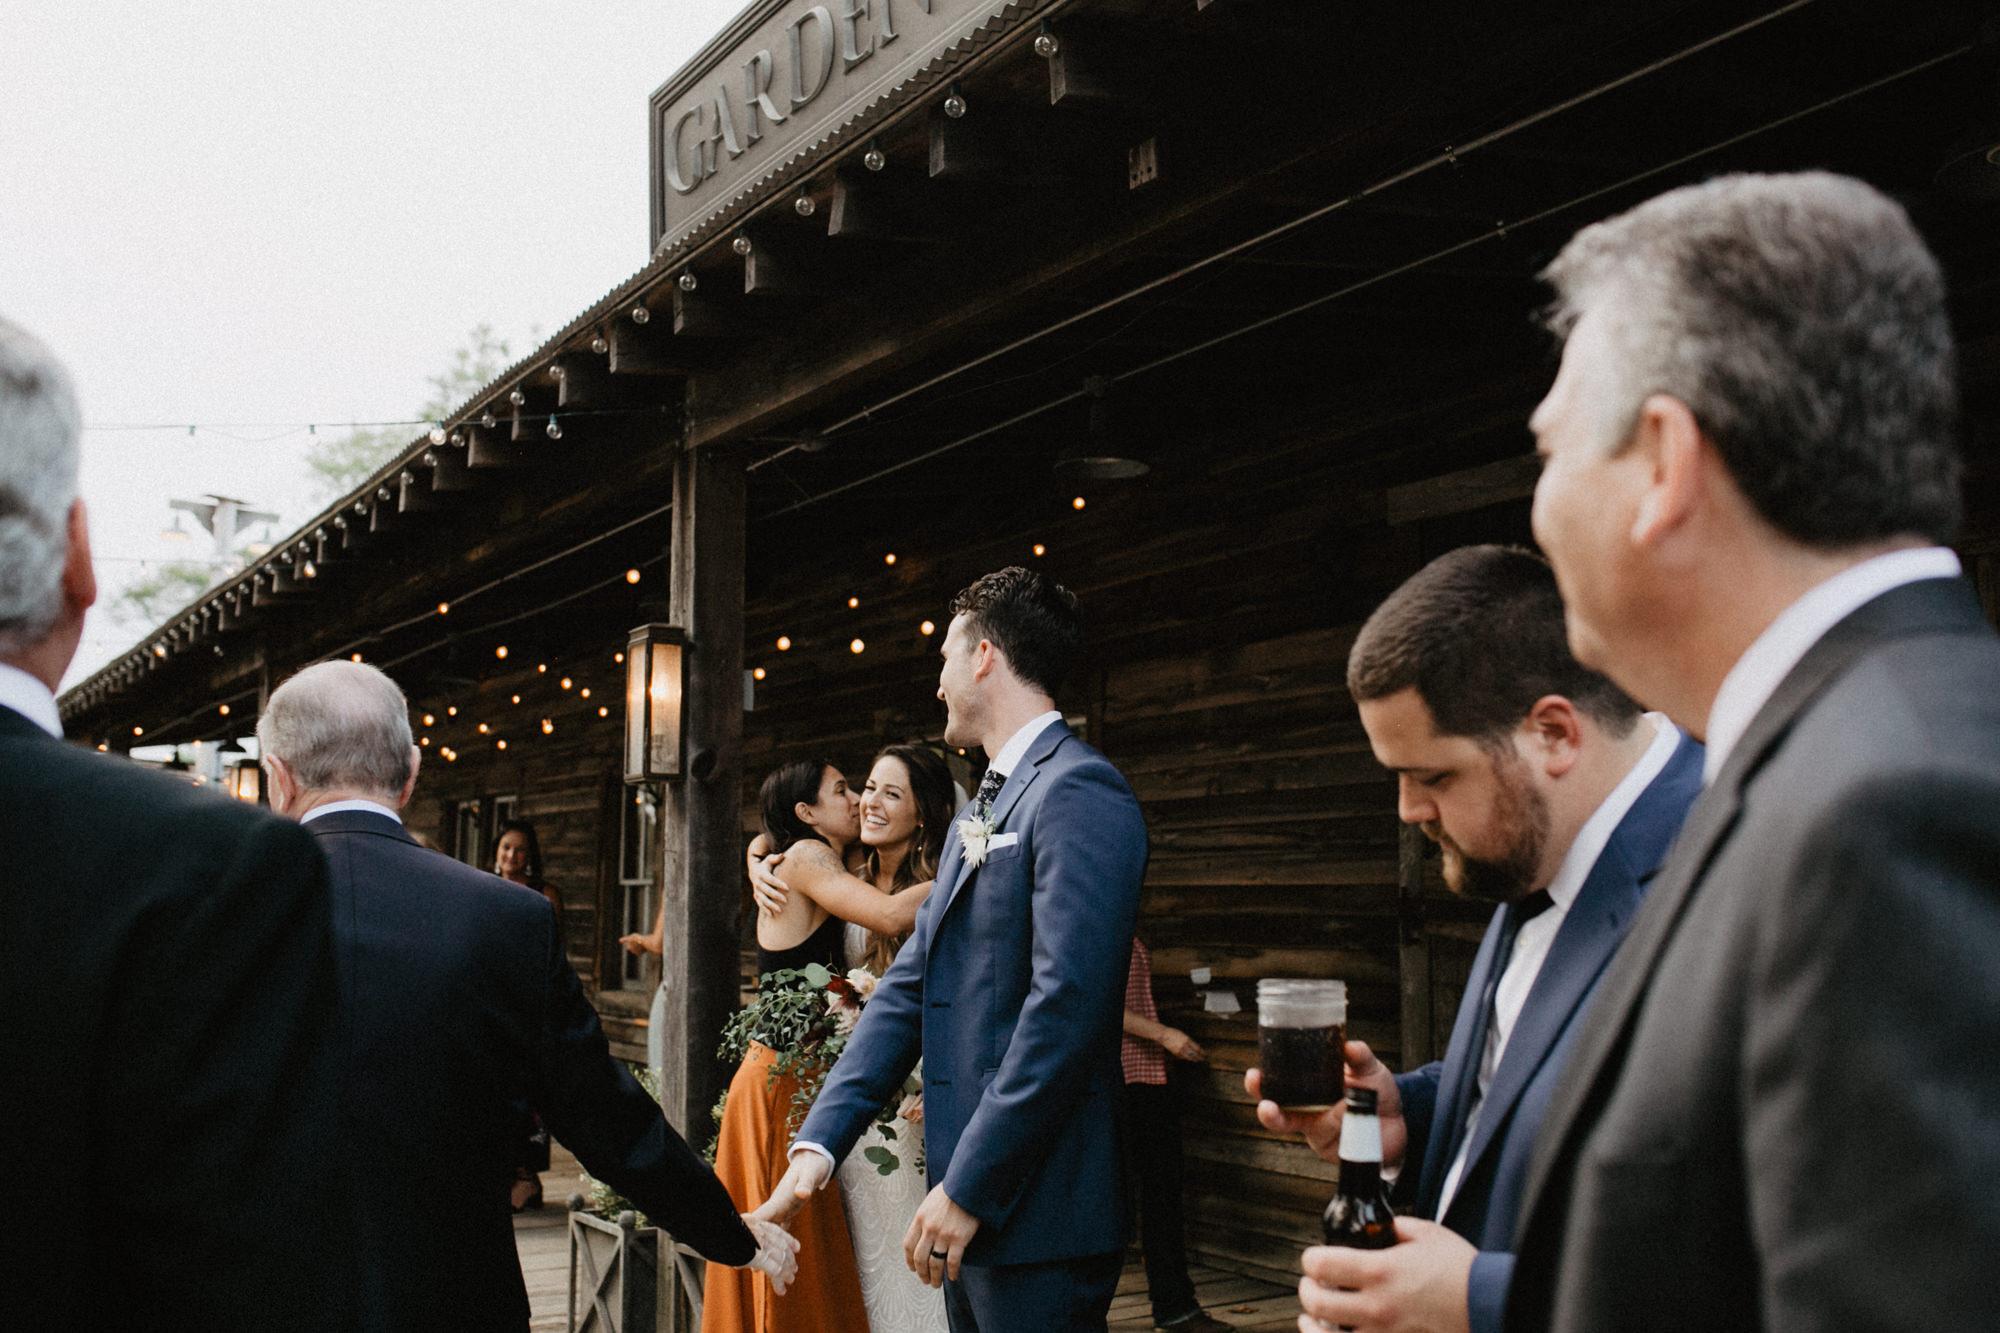 terrain-events-wedding-photographer-46.jpg